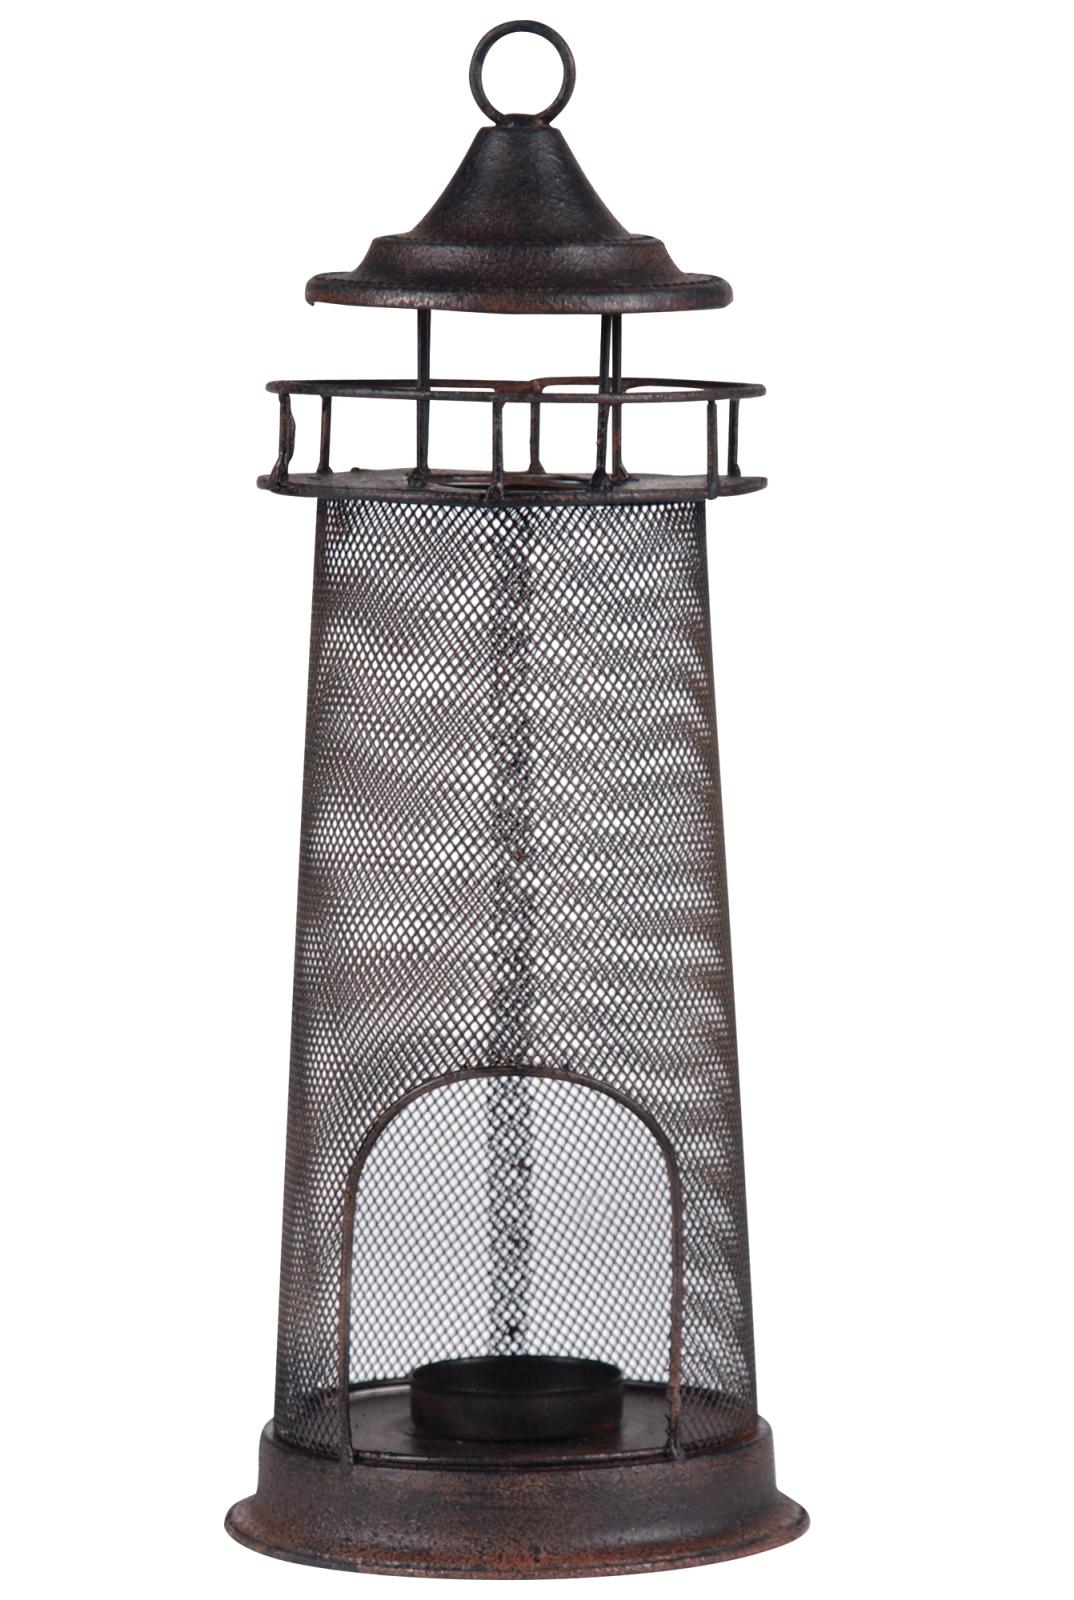 Hanging Lighthouse Tea Light Candle Holder 14 Inch Shaped Metal Tabletop Decor